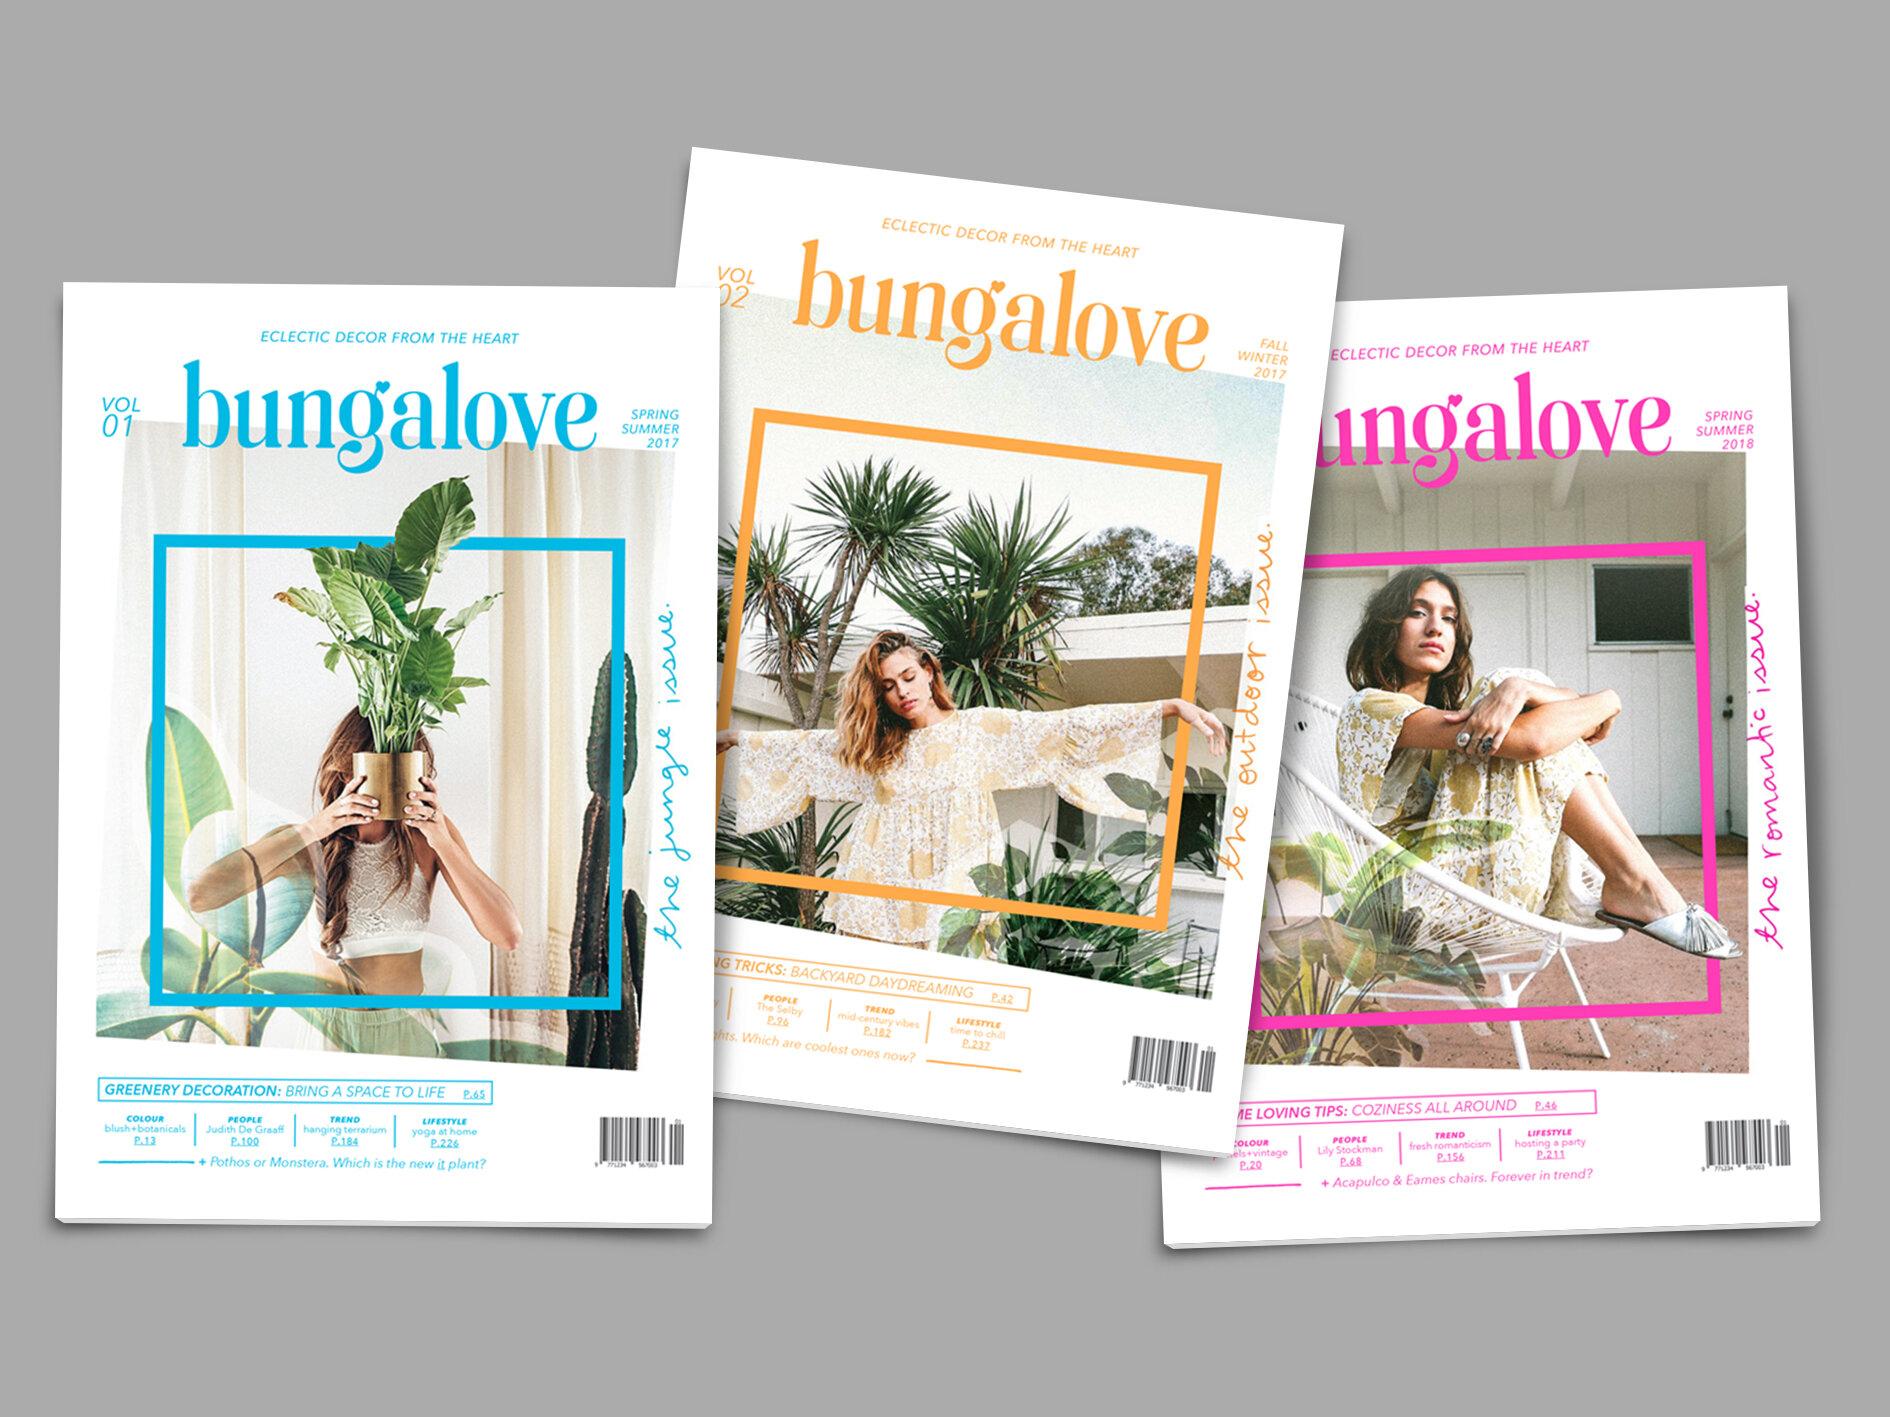 bungalove_03.jpg